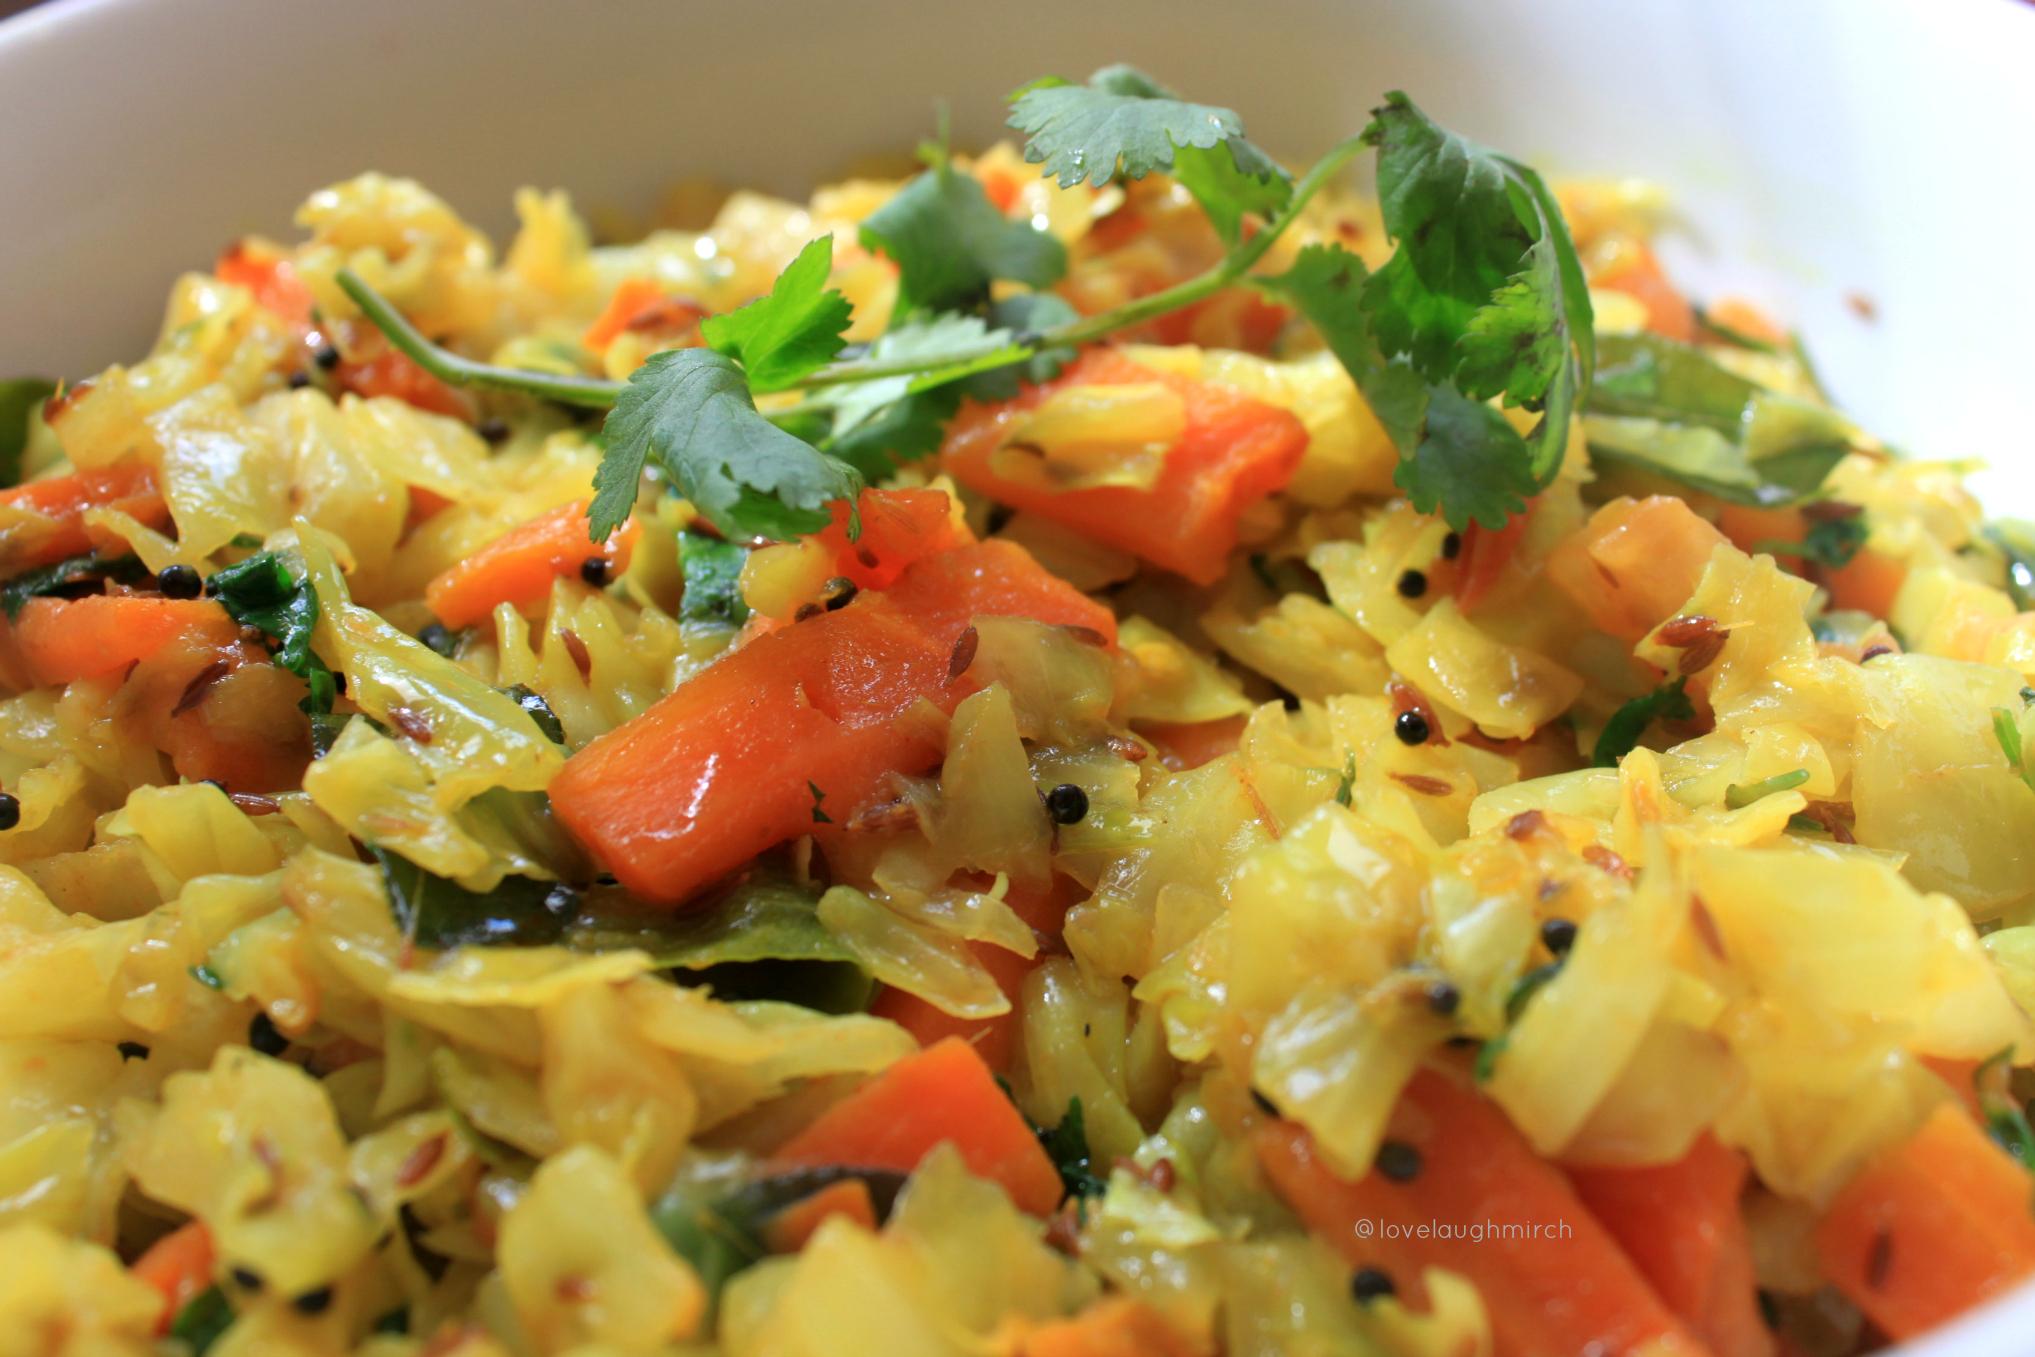 Gajar & Pata Gobi Sabzi {Spiced Carrot & Cabbage Stir Fry}